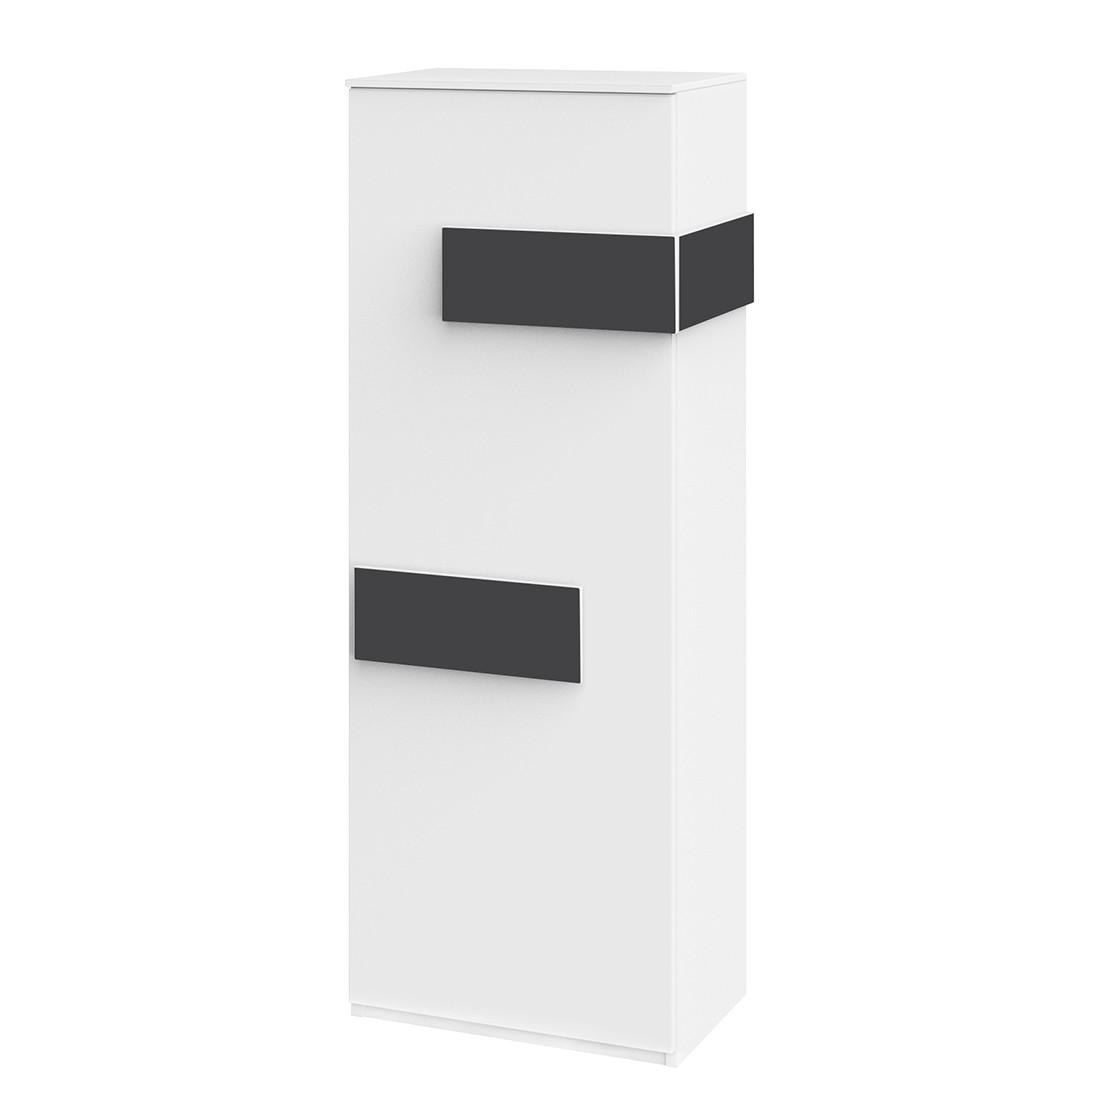 Hochschrank HiLight – Weiß / Anthrazit – 51 cm (1-türig) – Türanschlag links – 144 cm, röhr günstig kaufen